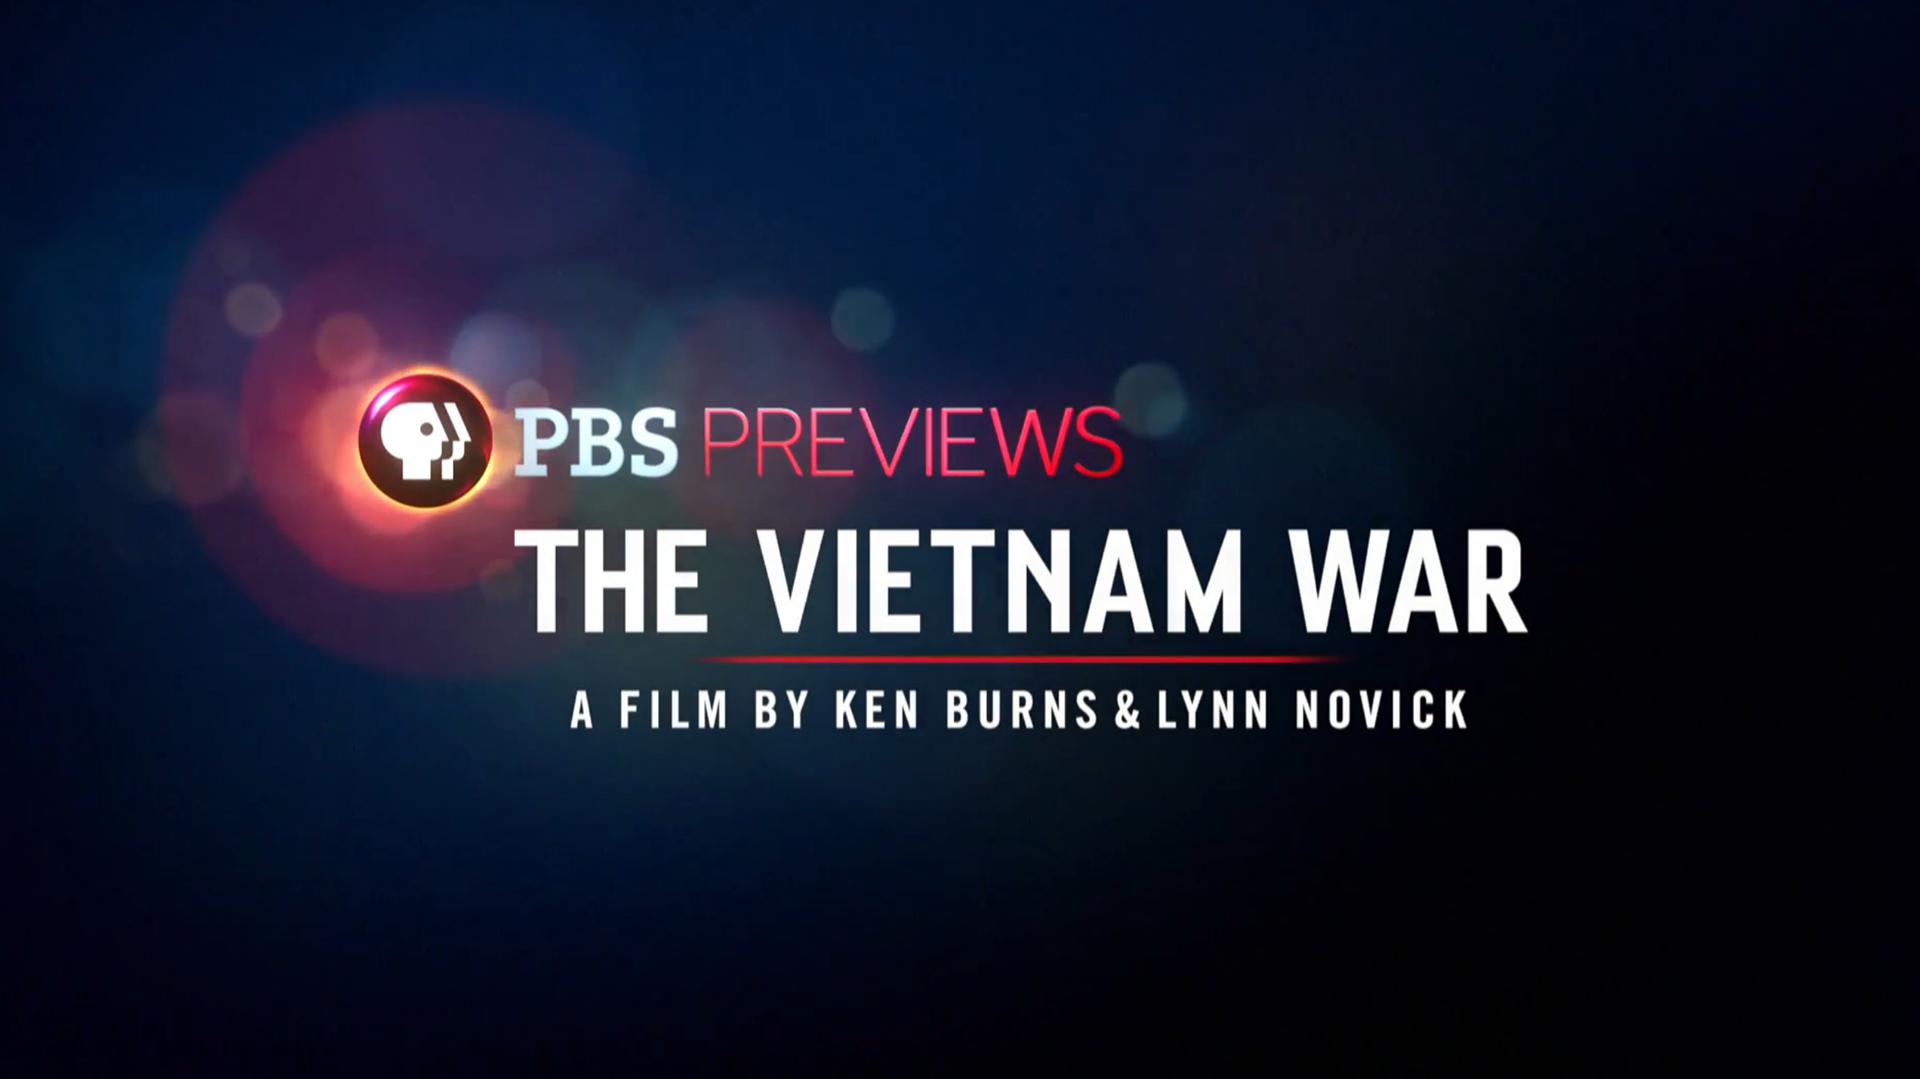 PBS Previews: The Vietnam War | Promo